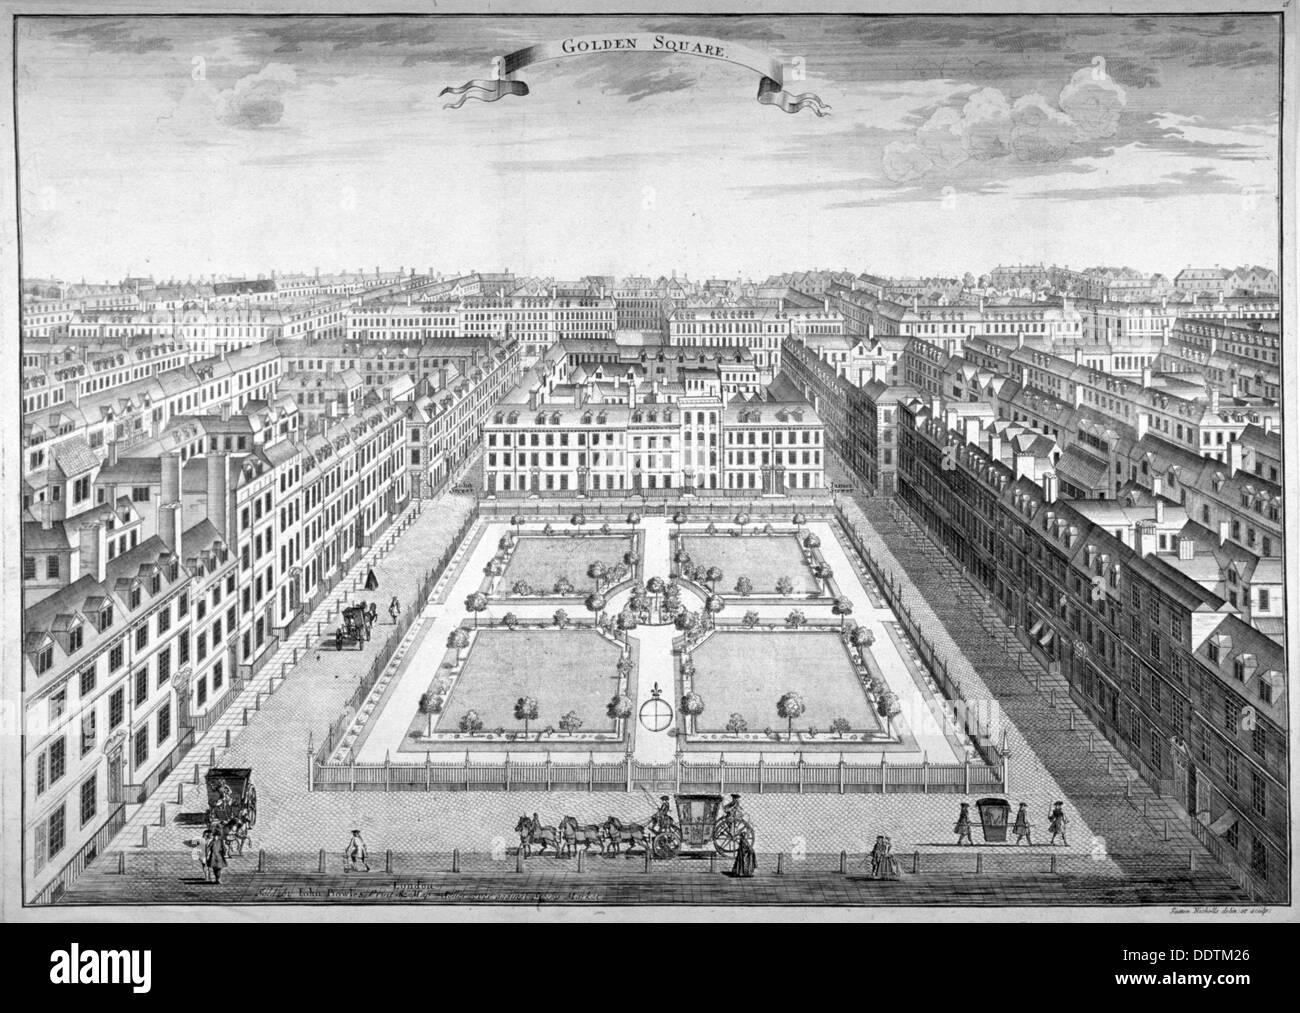 Golden Square, Westminster, London, 1754. Artist: Sutton Nicholls - Stock Image